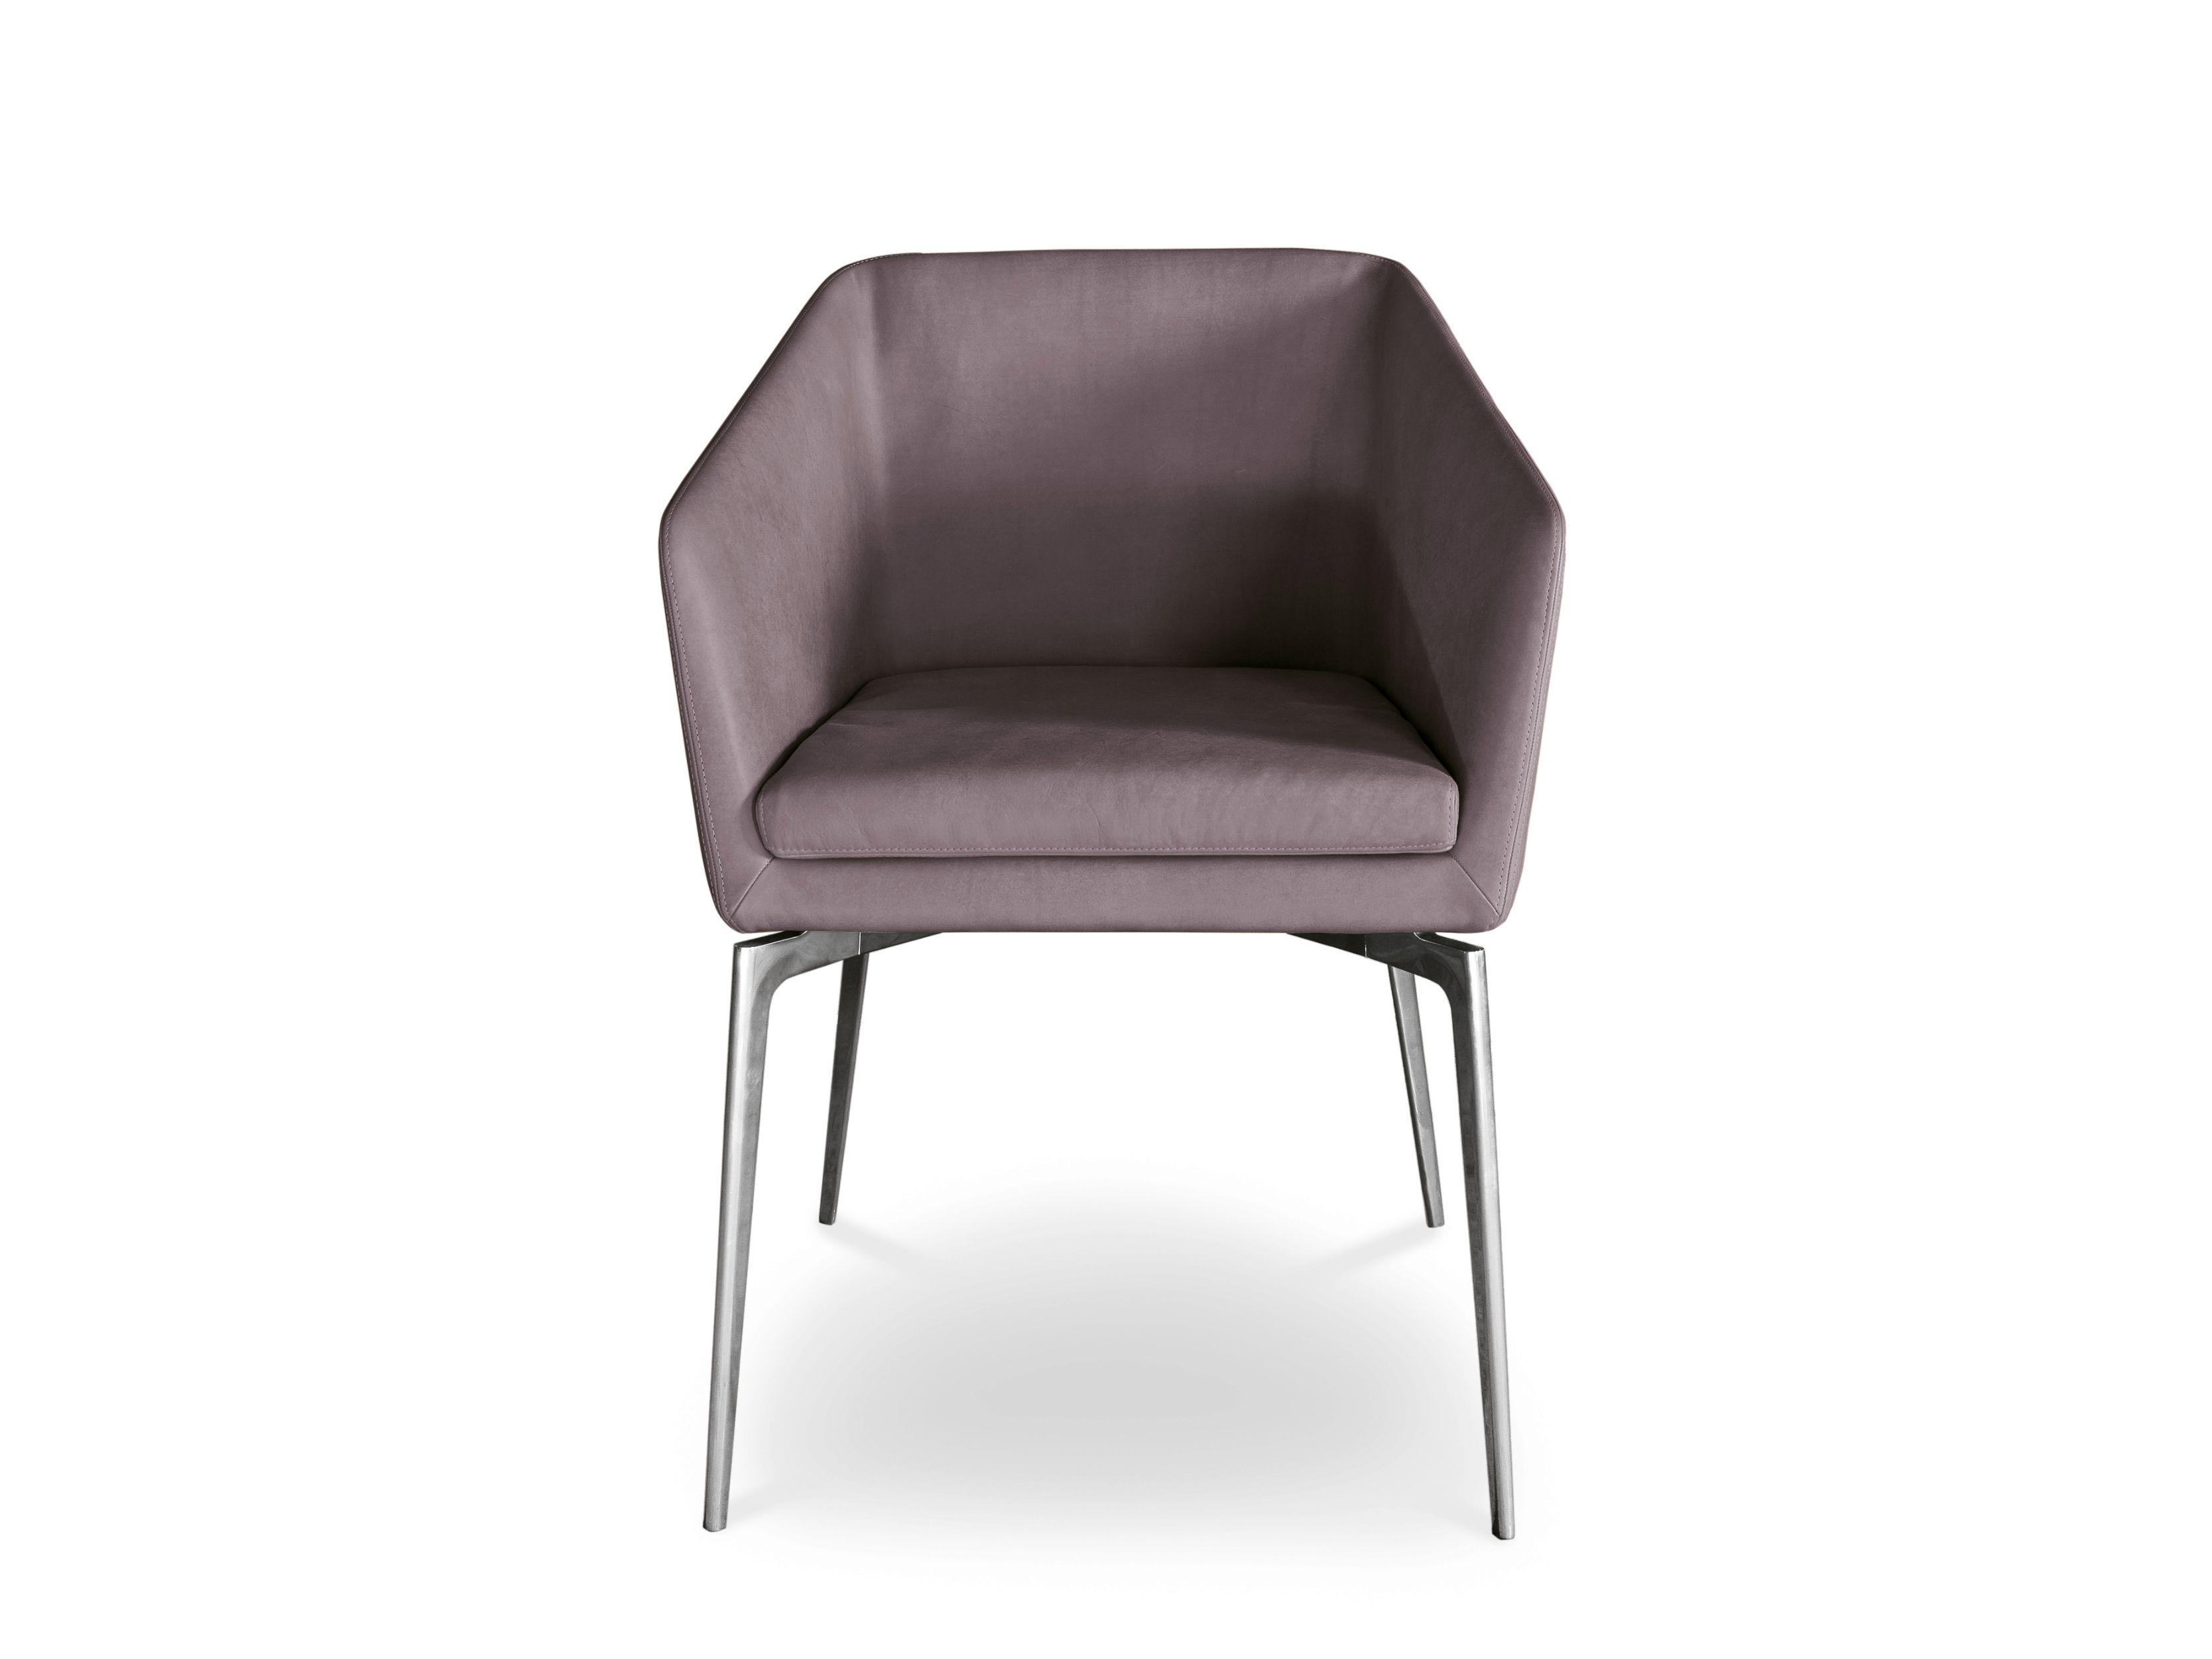 Denise petit fauteuil by alivar design giuseppe bavuso - Petit fauteuil en cuir ...